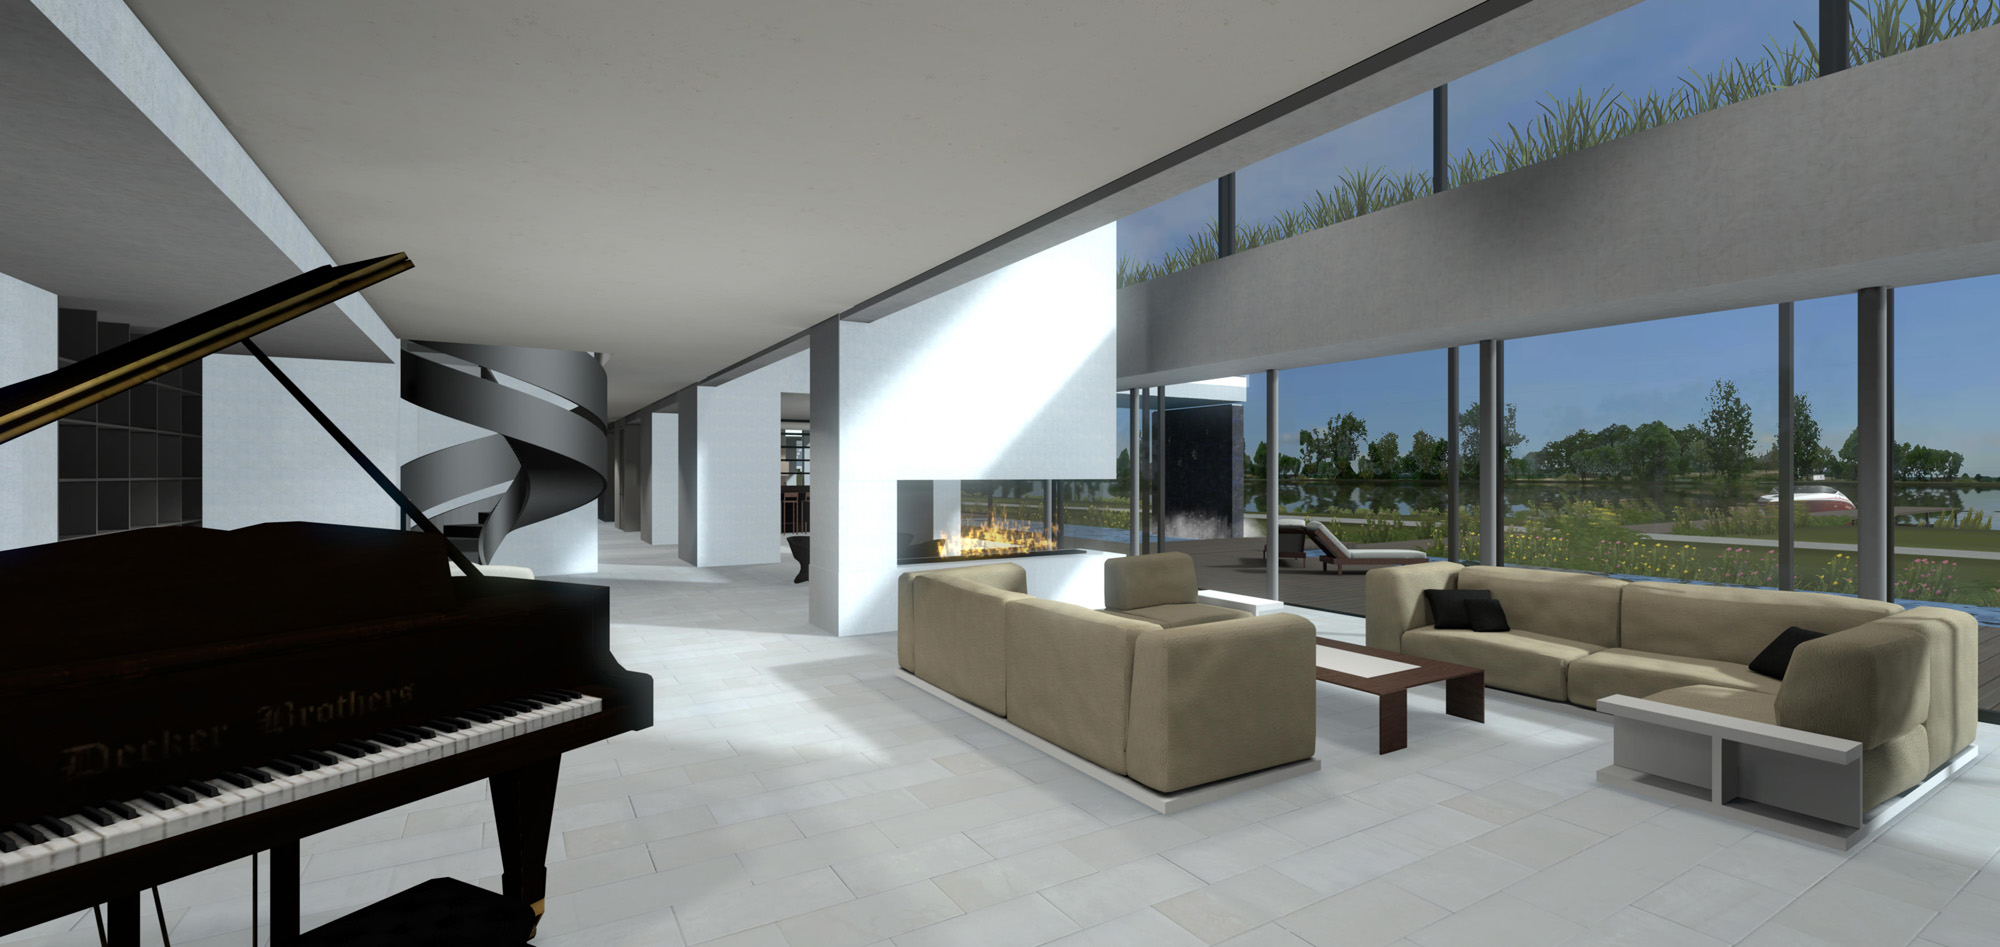 Bim Goes Virtual Oculus Rift And Virtual Reality Take Architectural Visualization To The Next Level